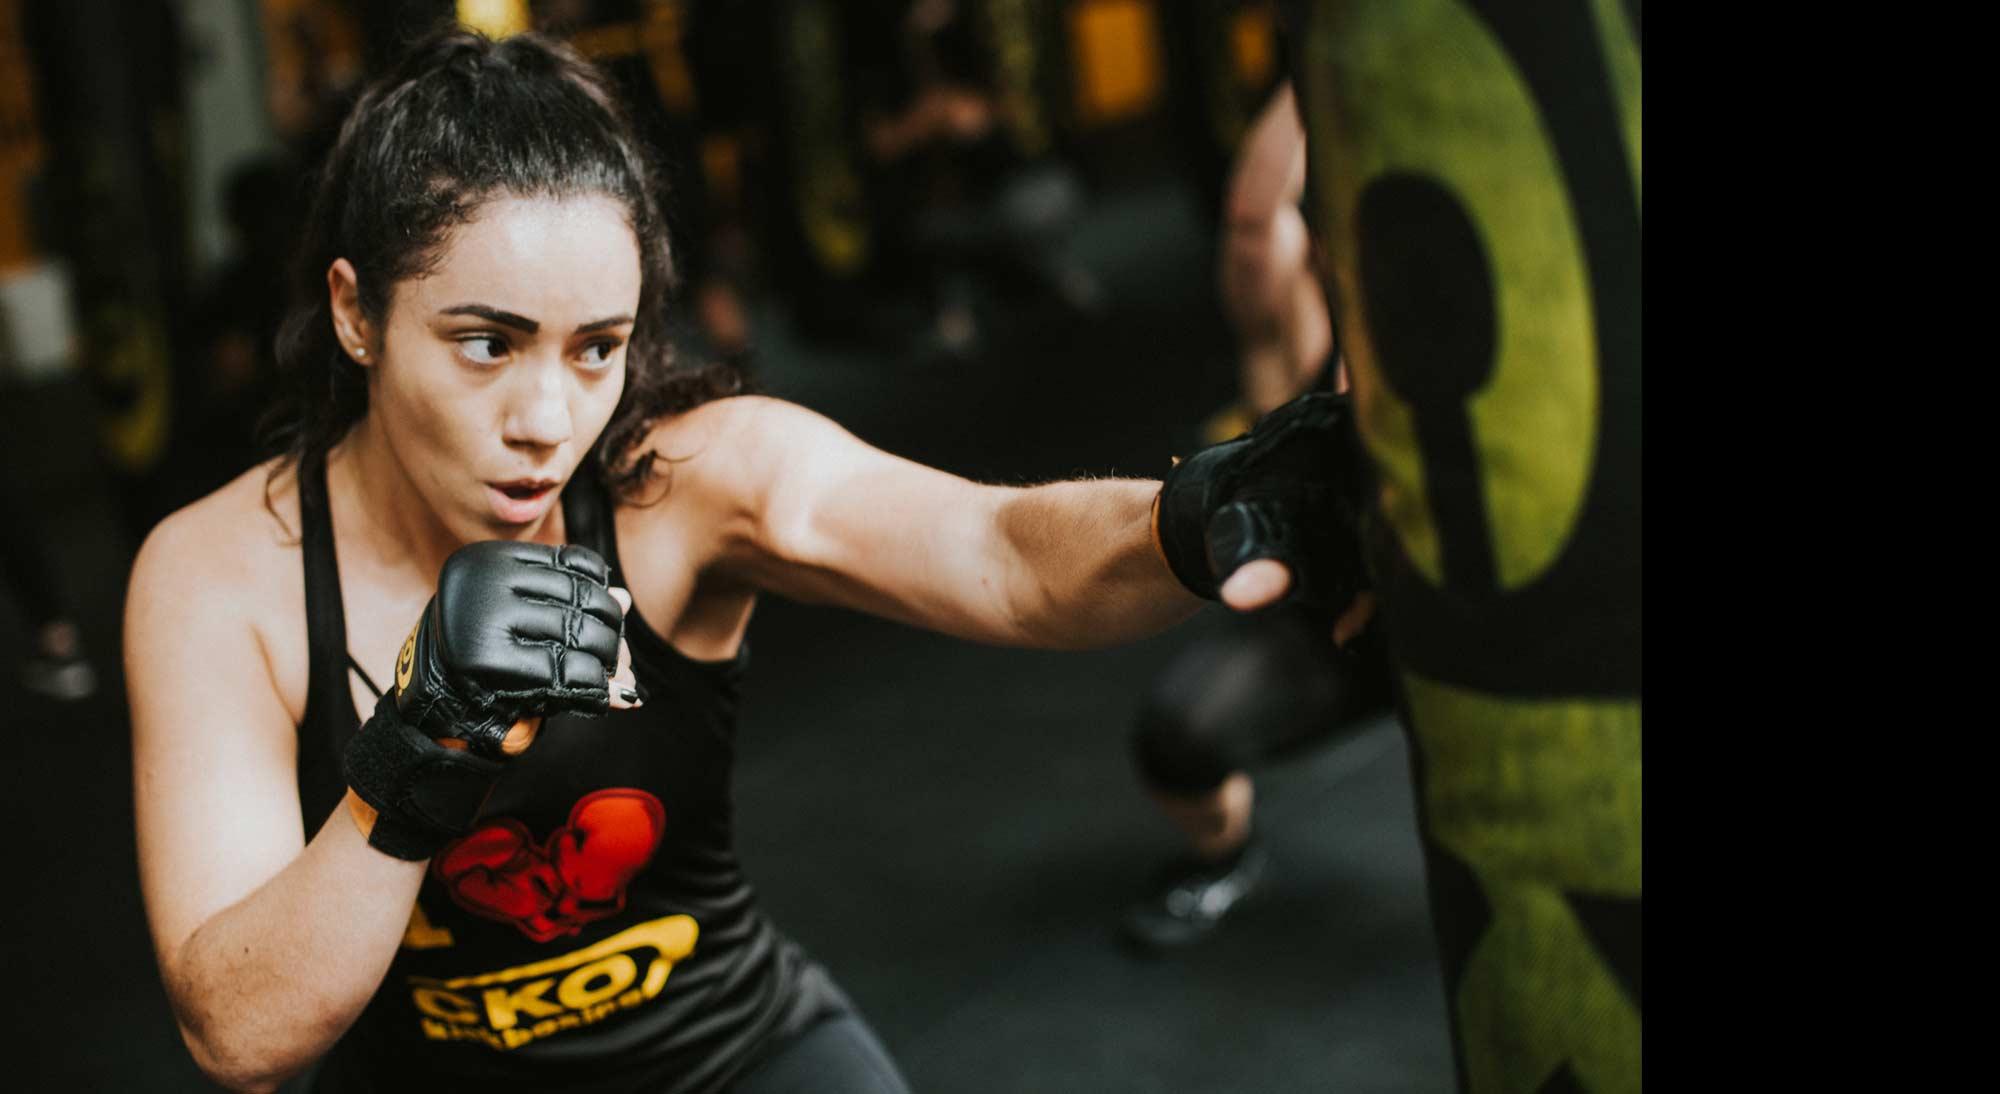 A woman hitting heavy punching bag.